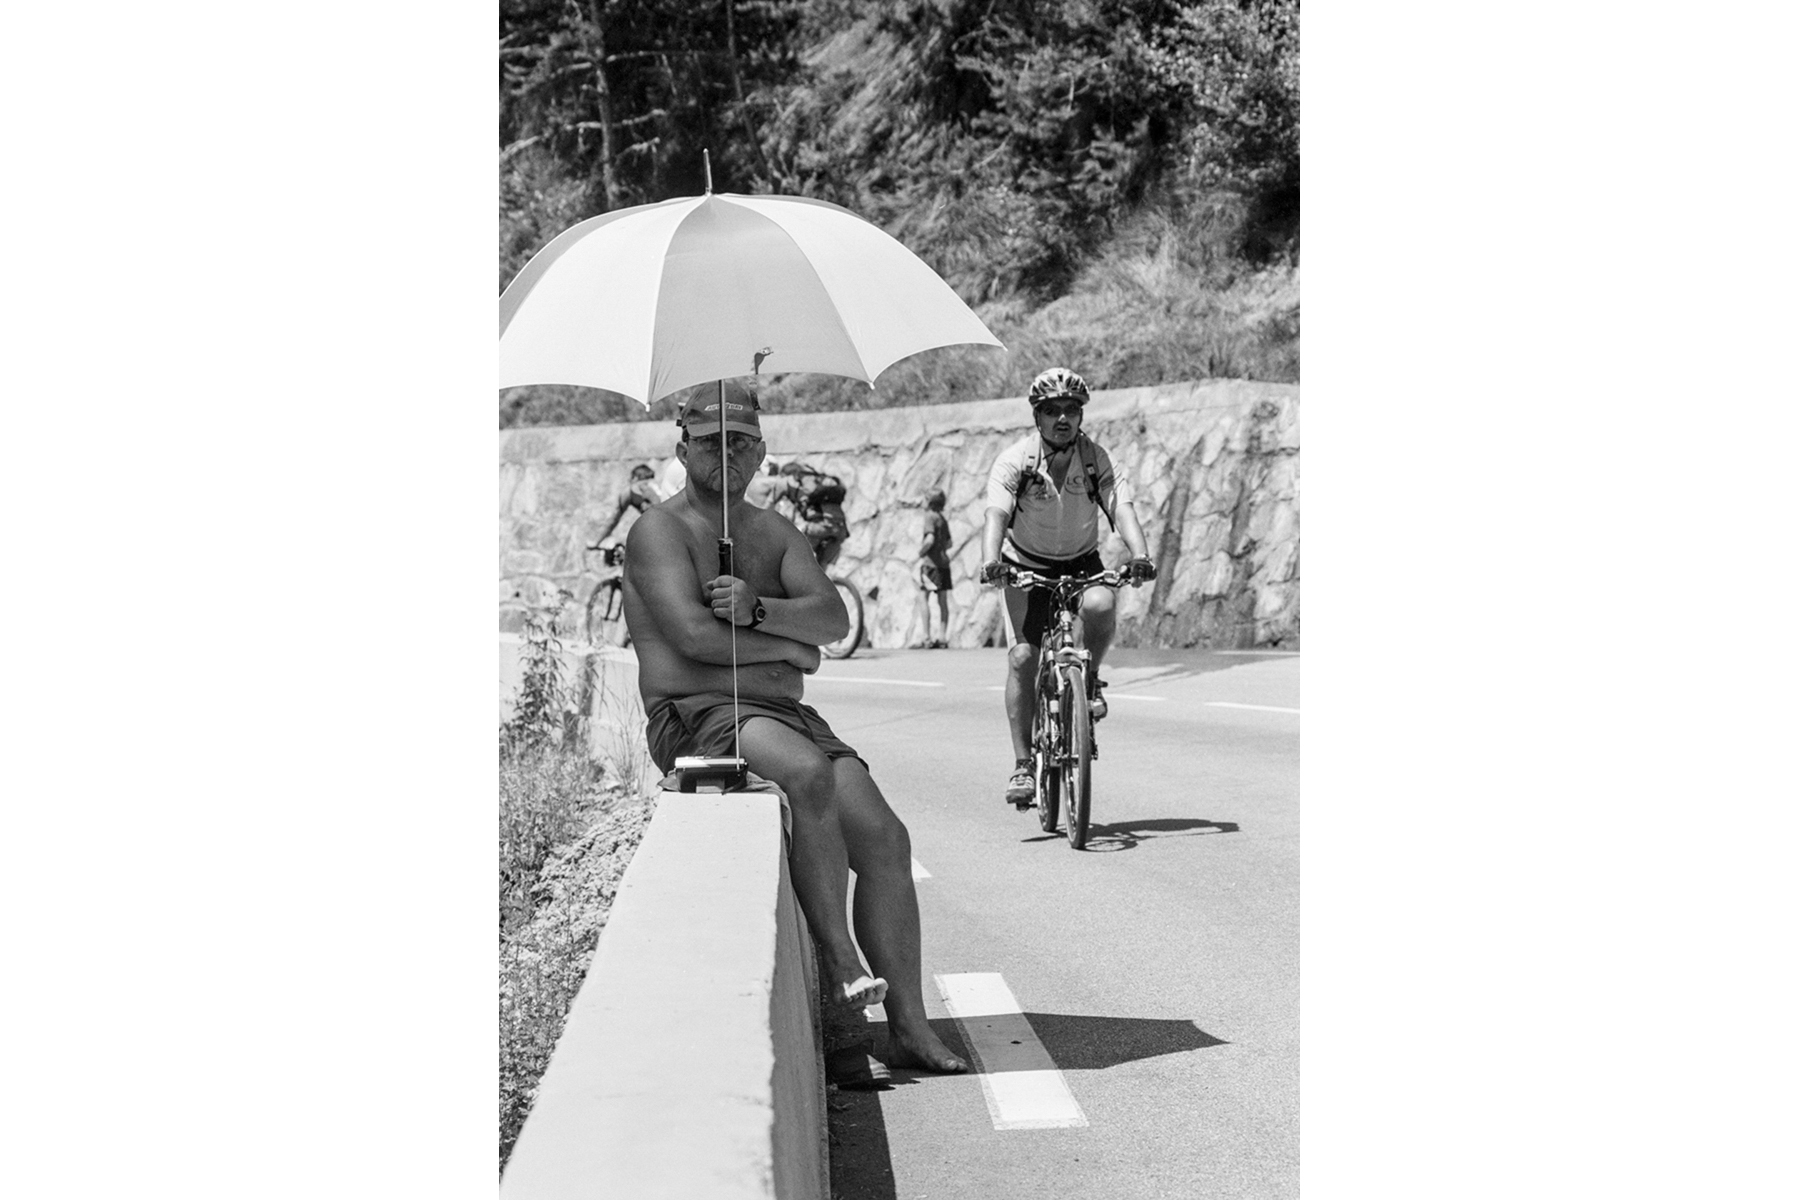 Tour de France 2006 Those who don't cycle, simply enjoy the ambience on the mountain, contemplating others and listening to the radio. Ceux qui ne montent pas à vélo profitent de la montagne en regardant pédaler les autres ou en écoutant la radio. Wer nicht selber fährt, genießt die Atmosphäre am Berg, schaut zu und hört Radio. Quiénes no van montados en bici, también disfrutan del entorno, mirando a los que se esfuerzan pedaleando o bien escuchando la radio.